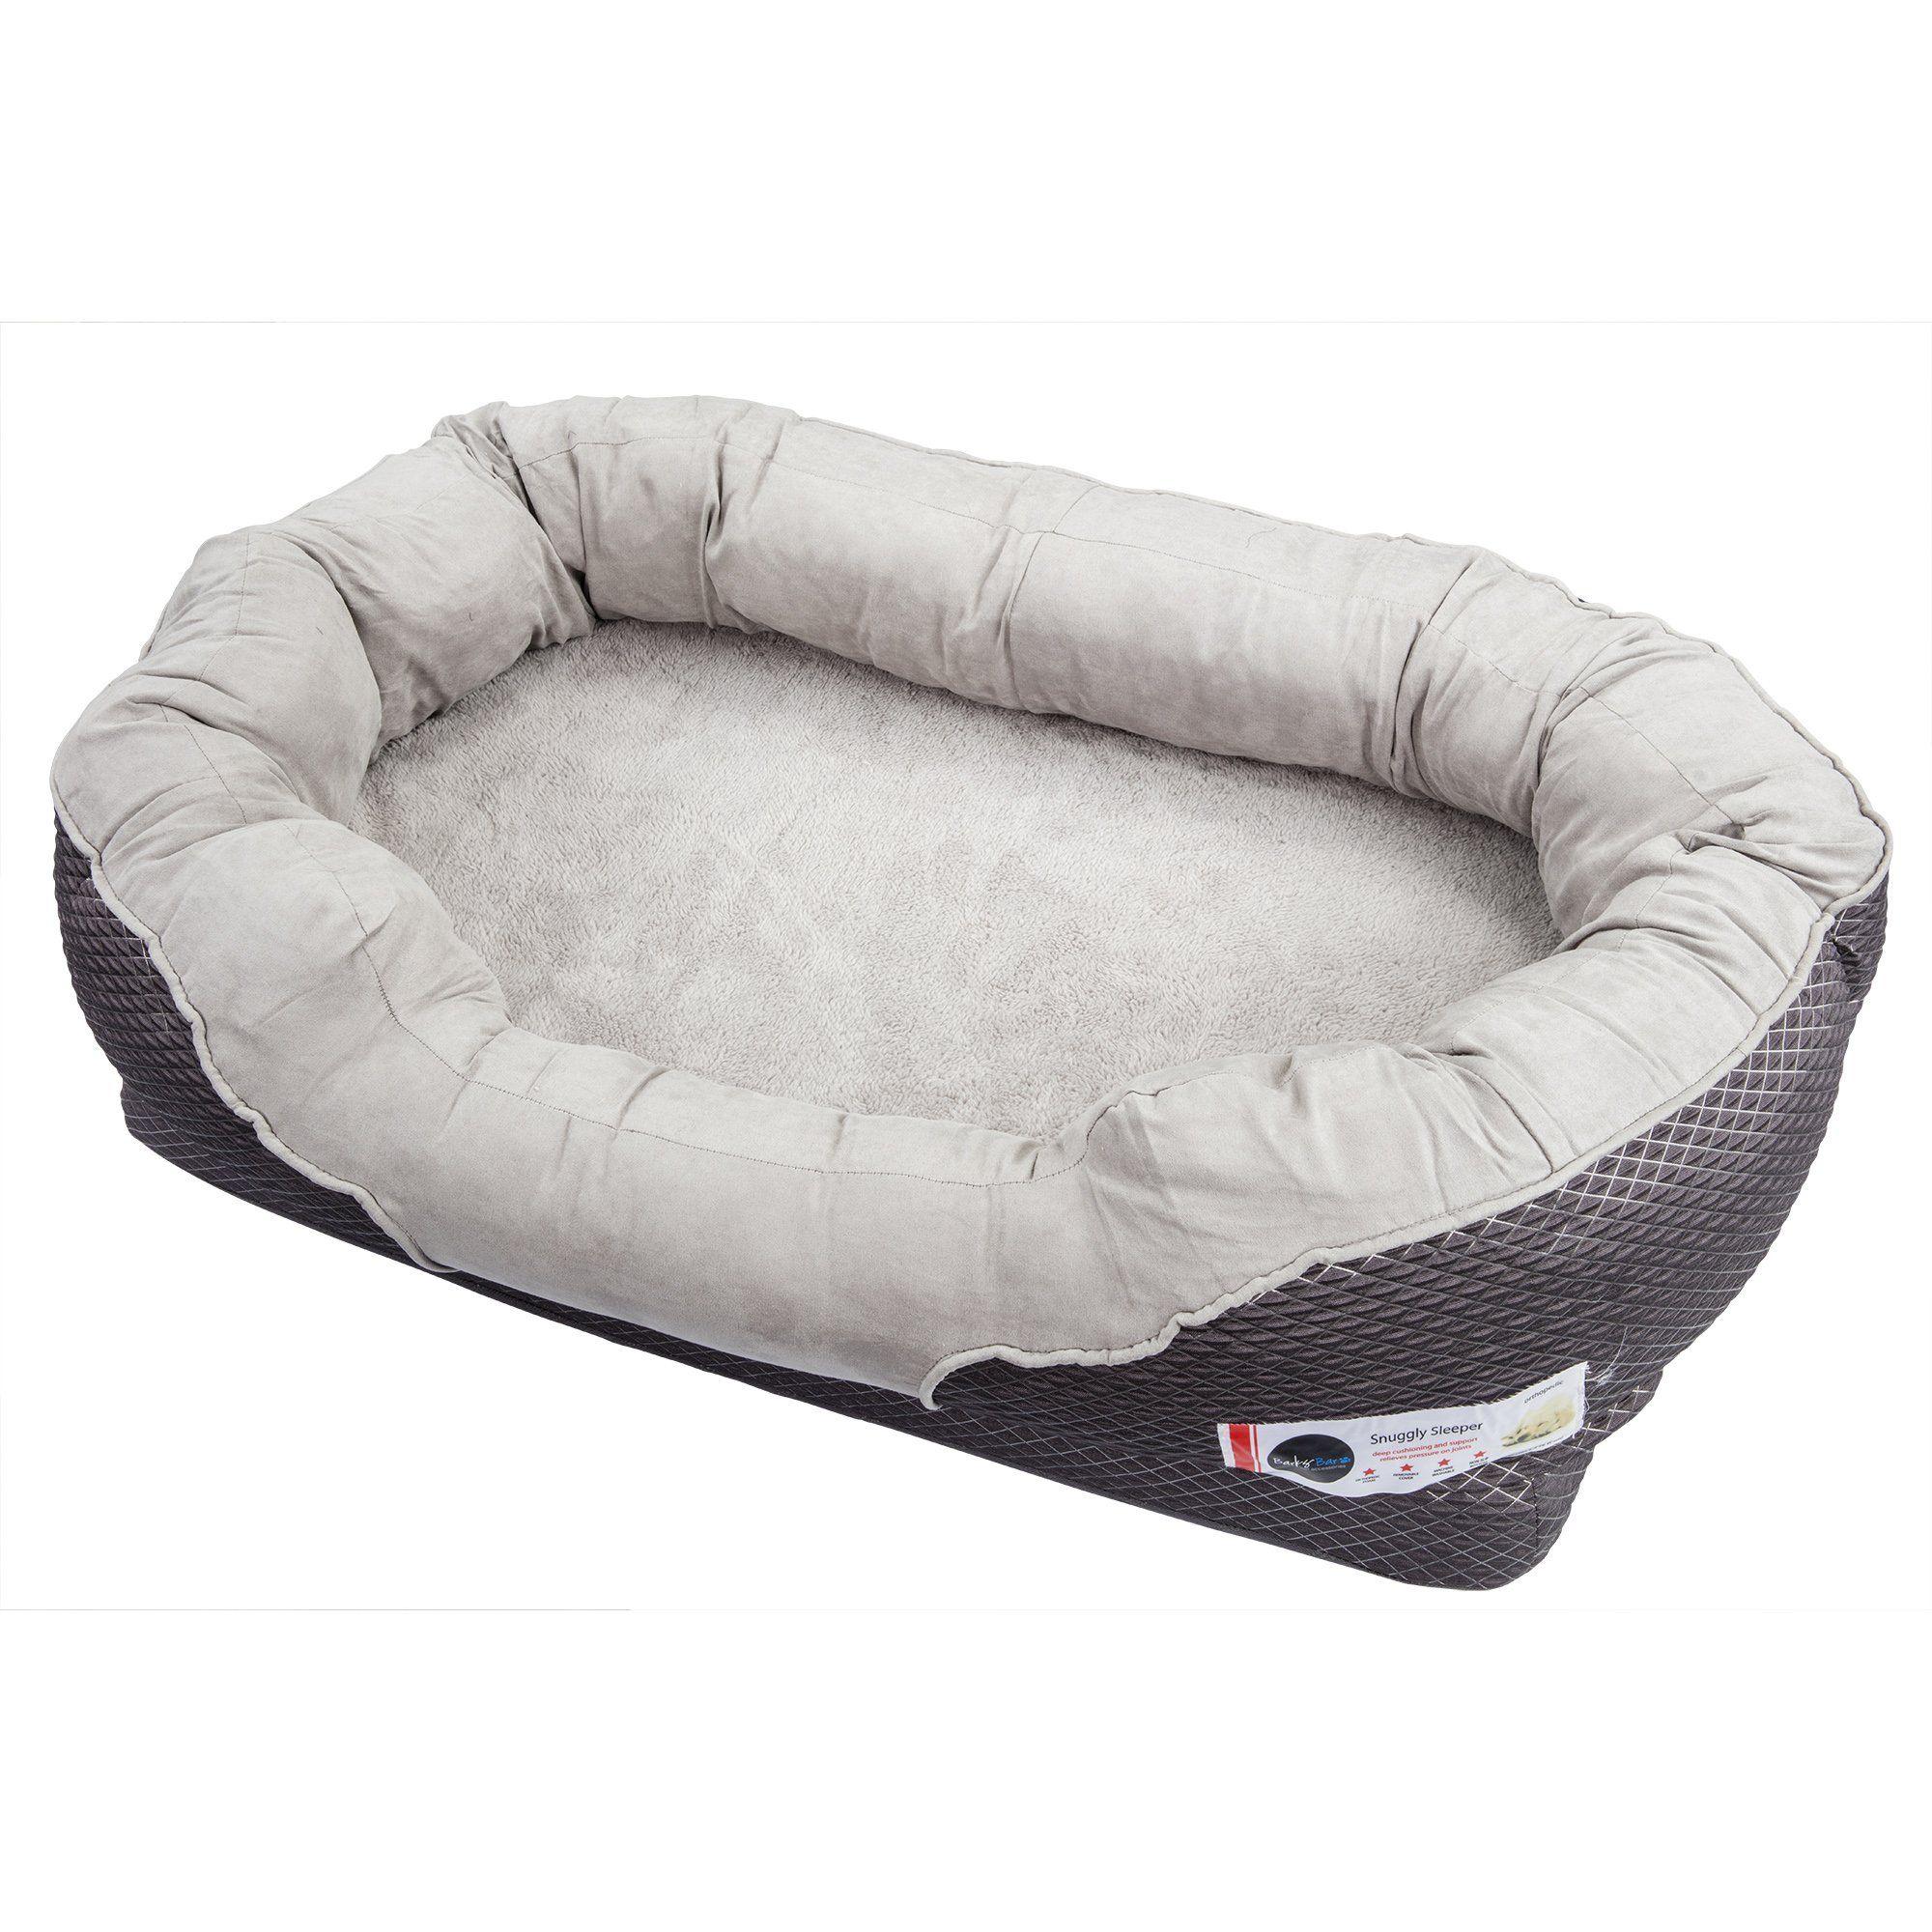 Barksbar Medium Gray Orthopedic Dog Bed 32 X 22 Inches Snuggly Sleeper With Grooved Orthopedic Foam Extra Comfy Cot Orthopedic Dog Bed Dog Bed Orthopedic Dog